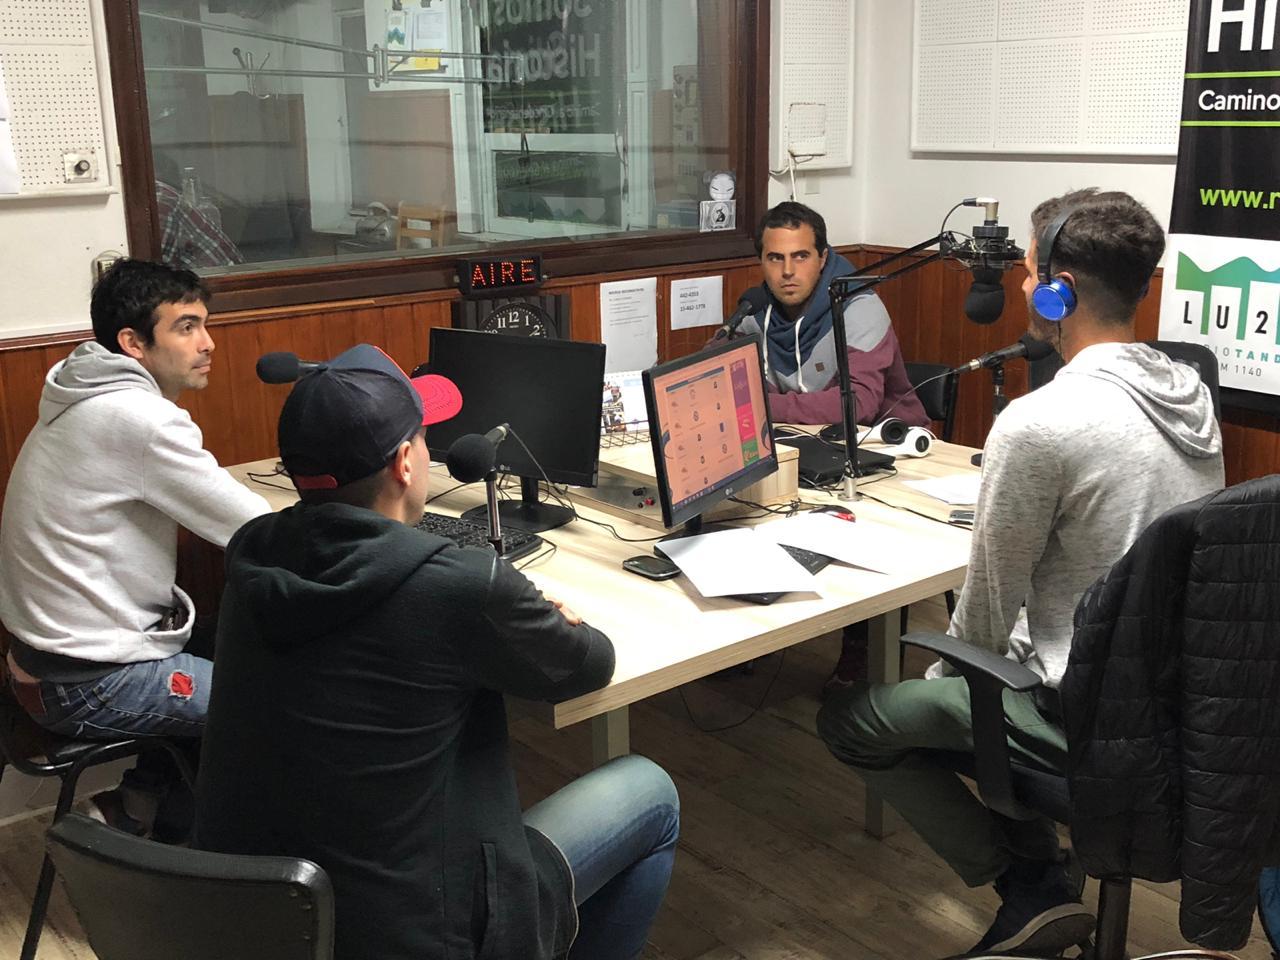 Programa Radio 4 - Inv: Sp. Cremaster